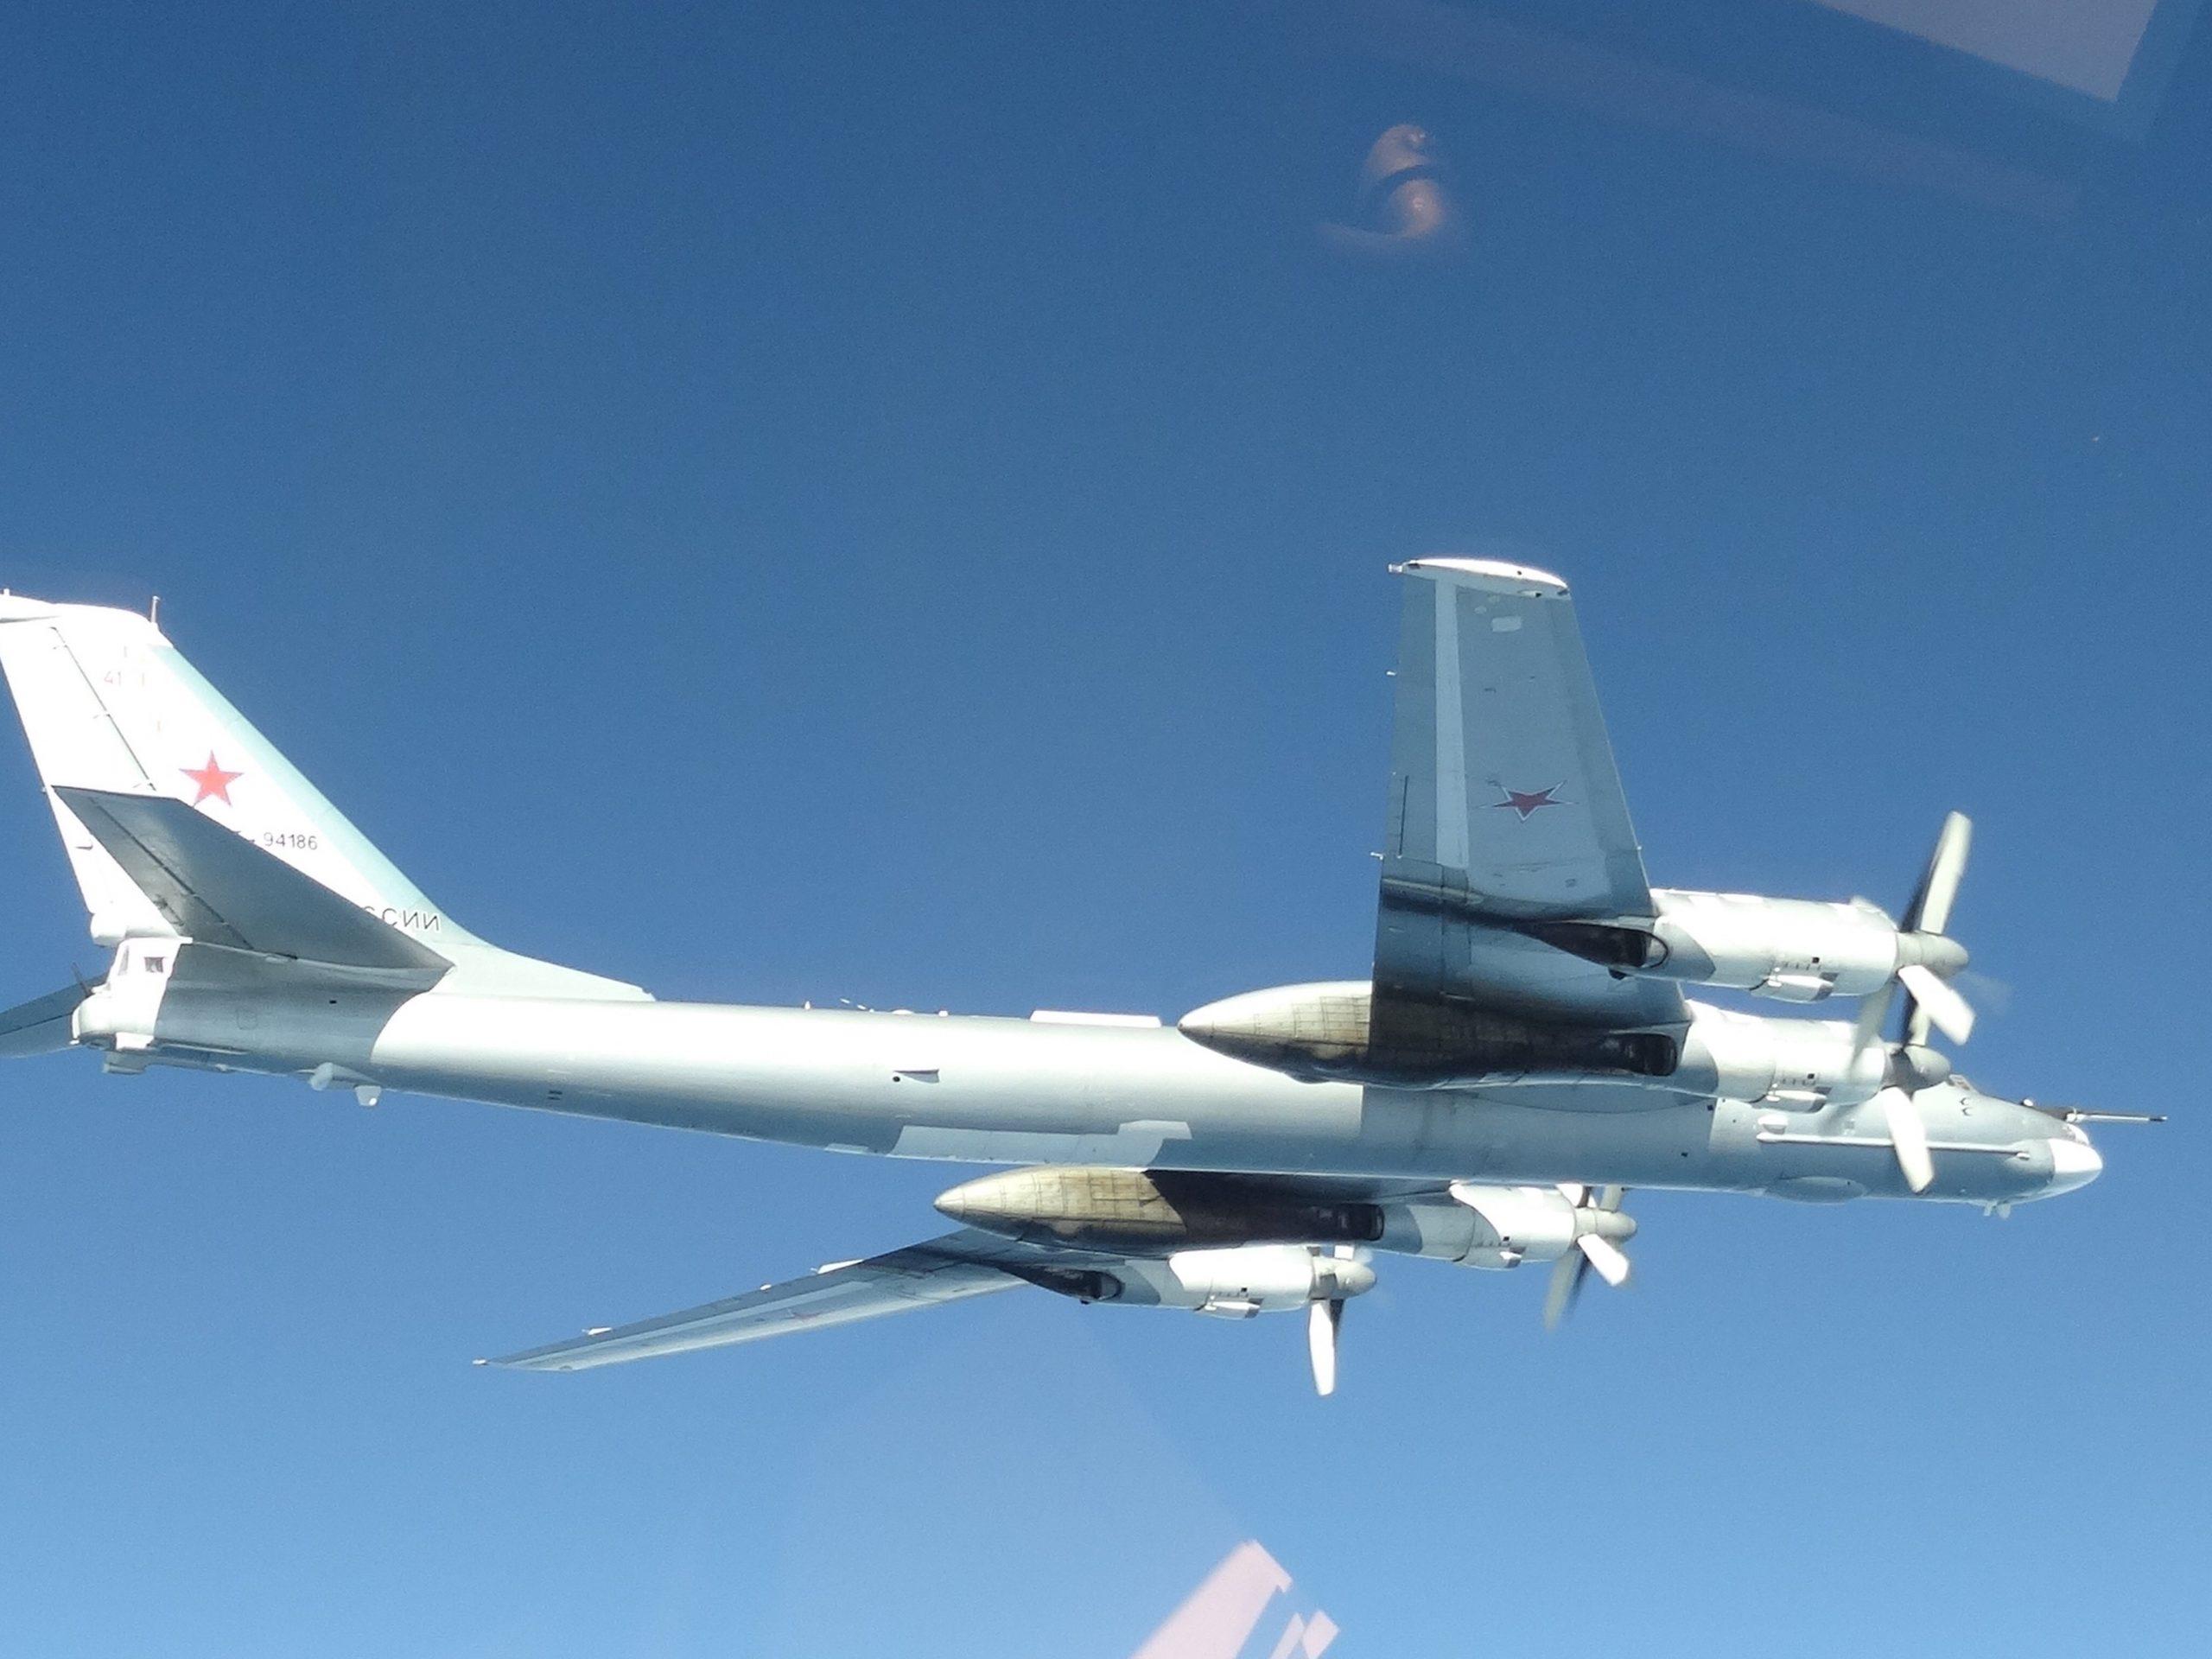 NORAD F-22s Intercept Russian Tu-95 Bombers Near Alaskan Airspace